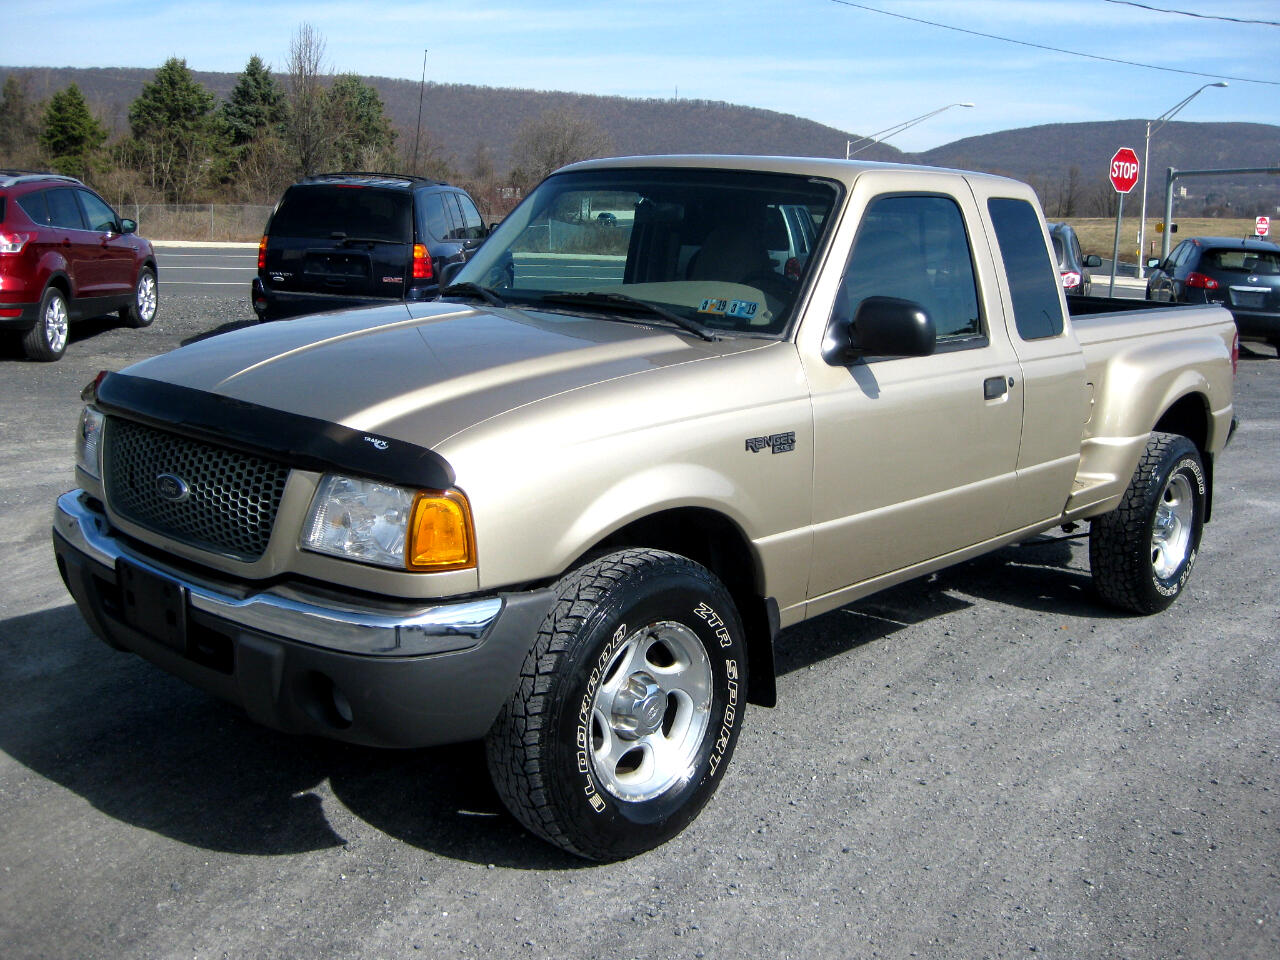 2001 Ford Ranger XLT SuperCab 2-Door 4WD